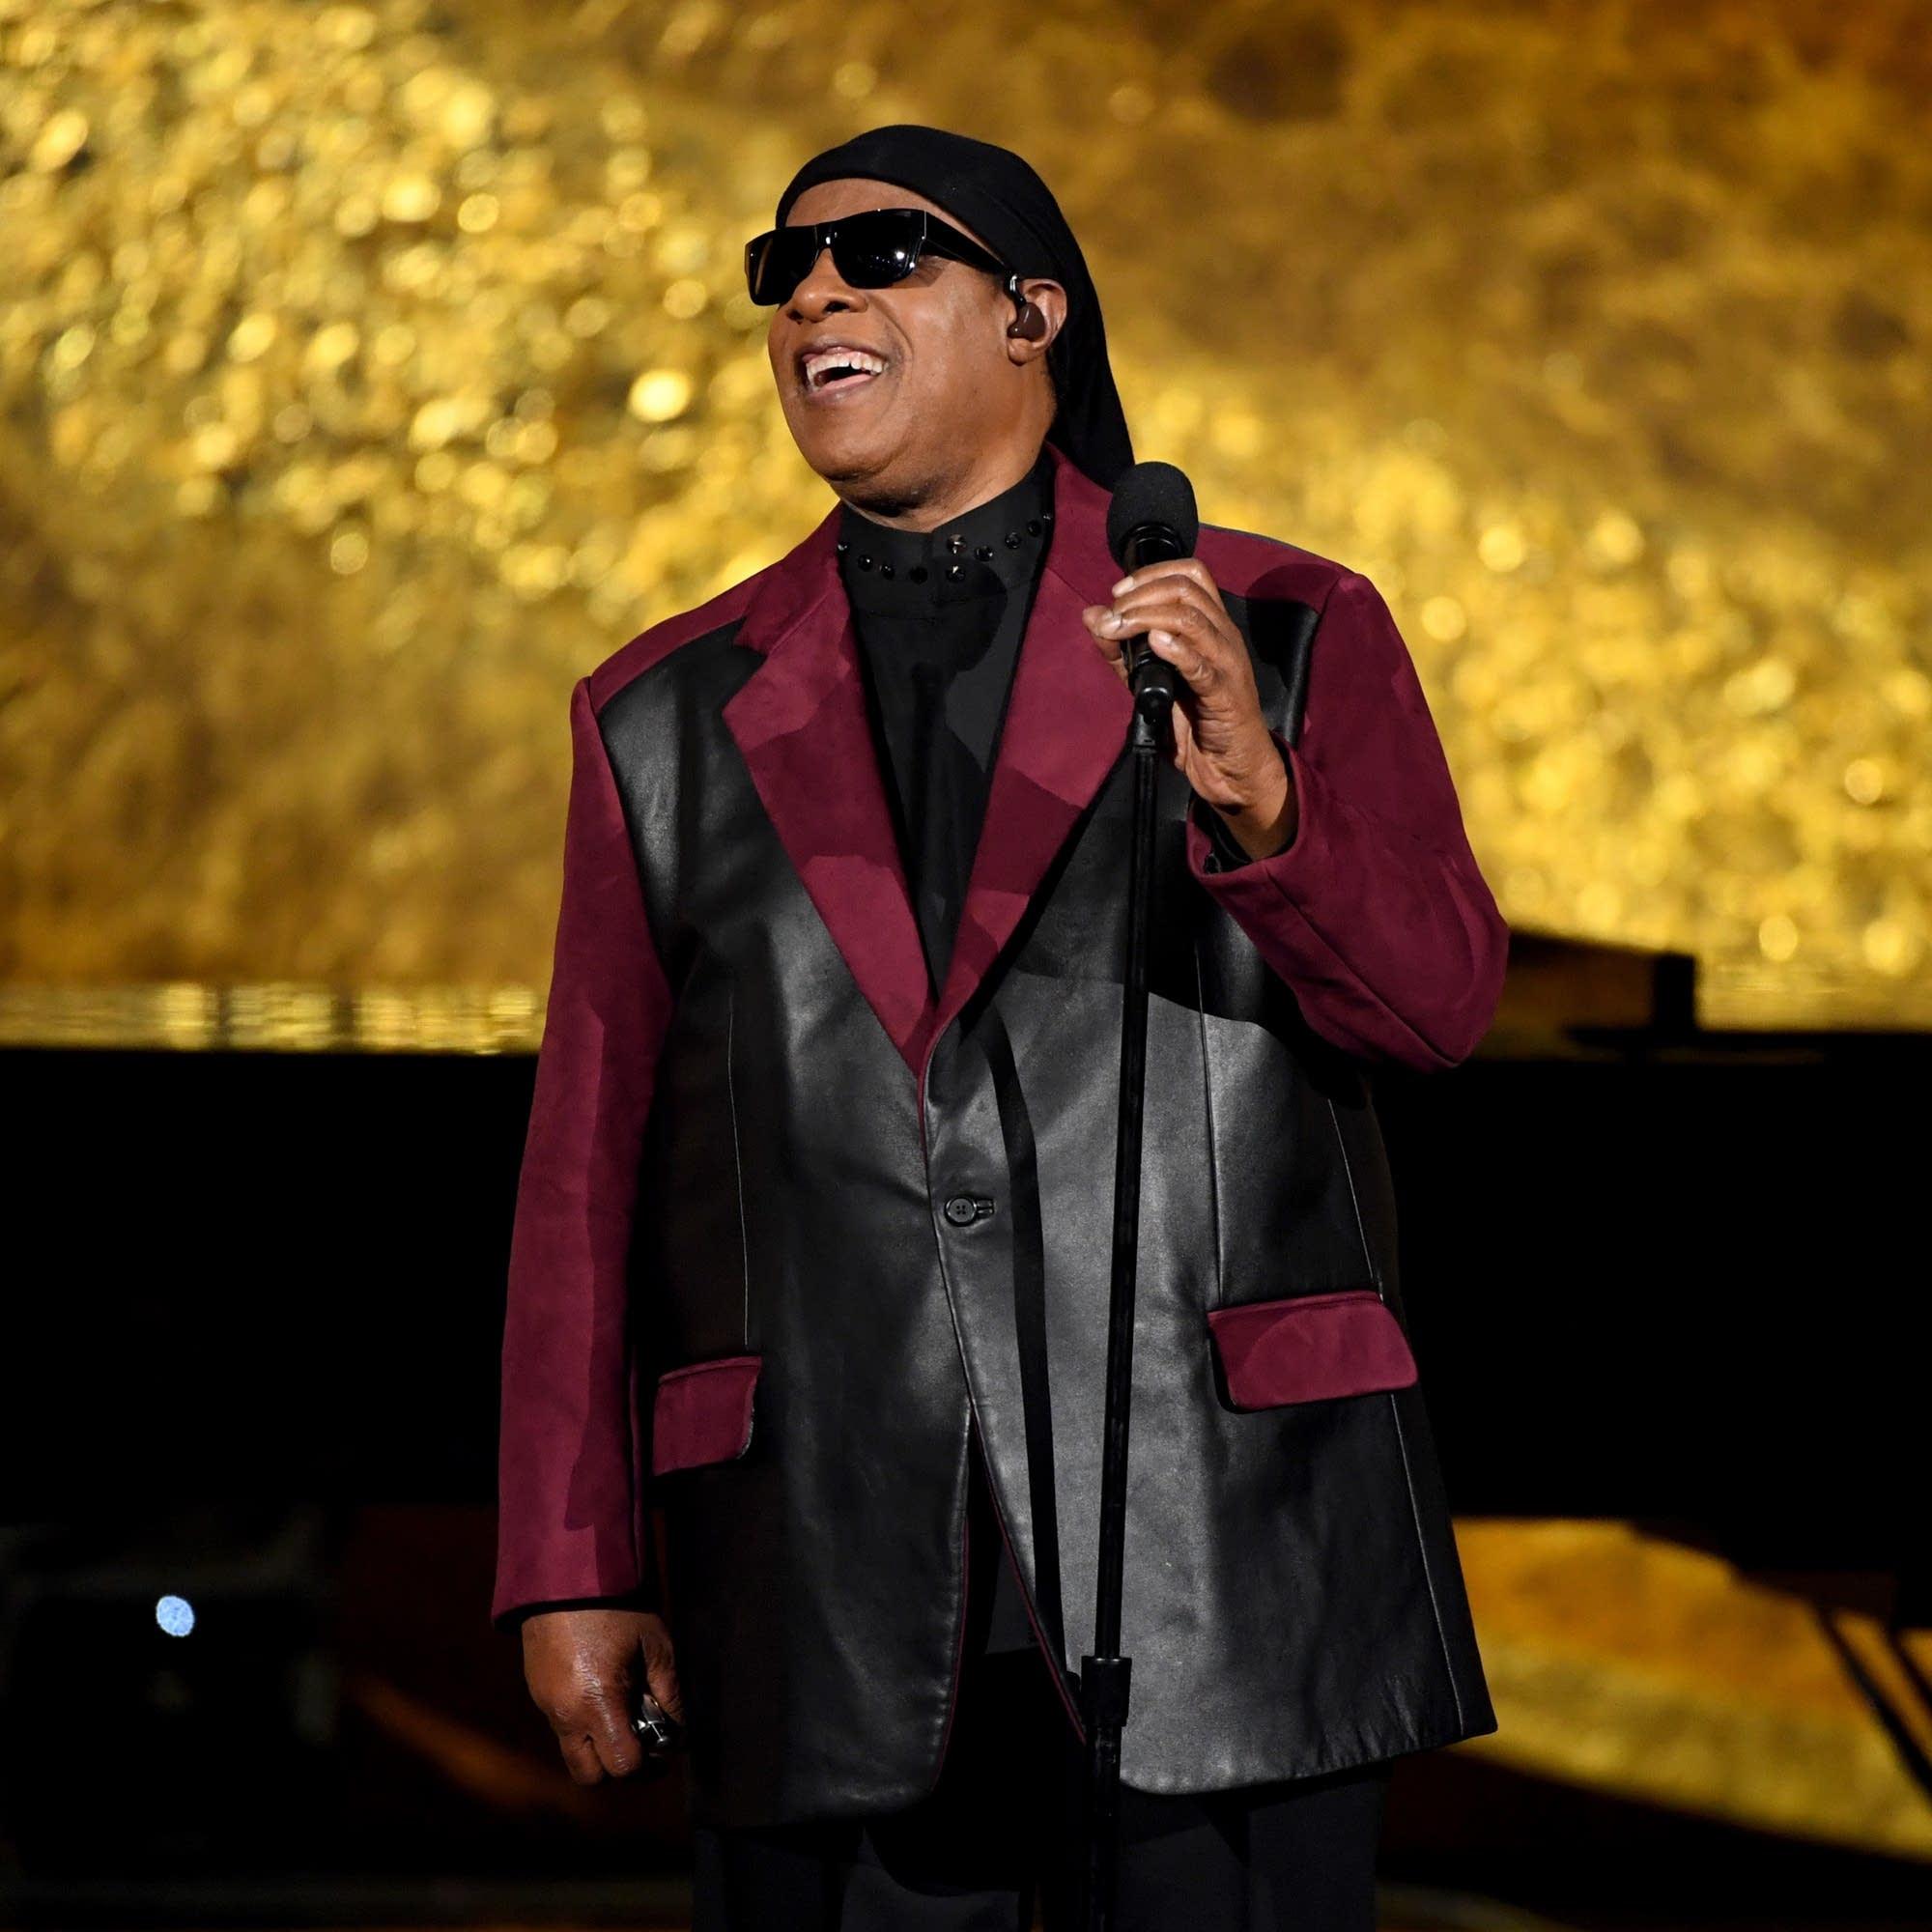 Stevie Wonder performs at a Quincy Jones tribute in Los Angeles, 2018.